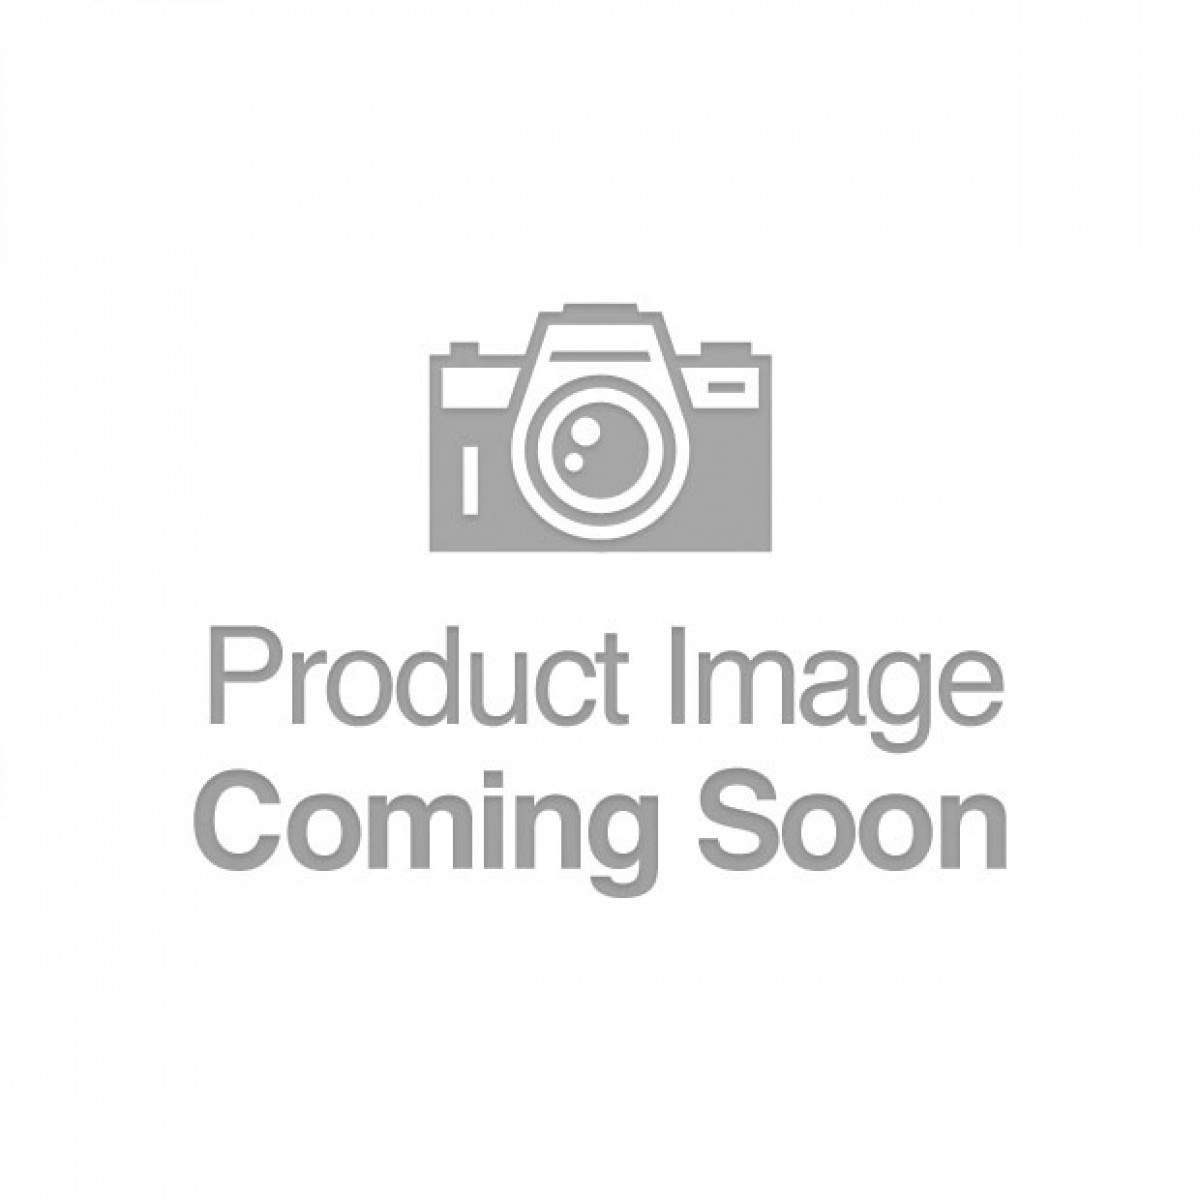 b-Vibe Swirl Texture Vibrating Plug X Zoe Ligon - Orange